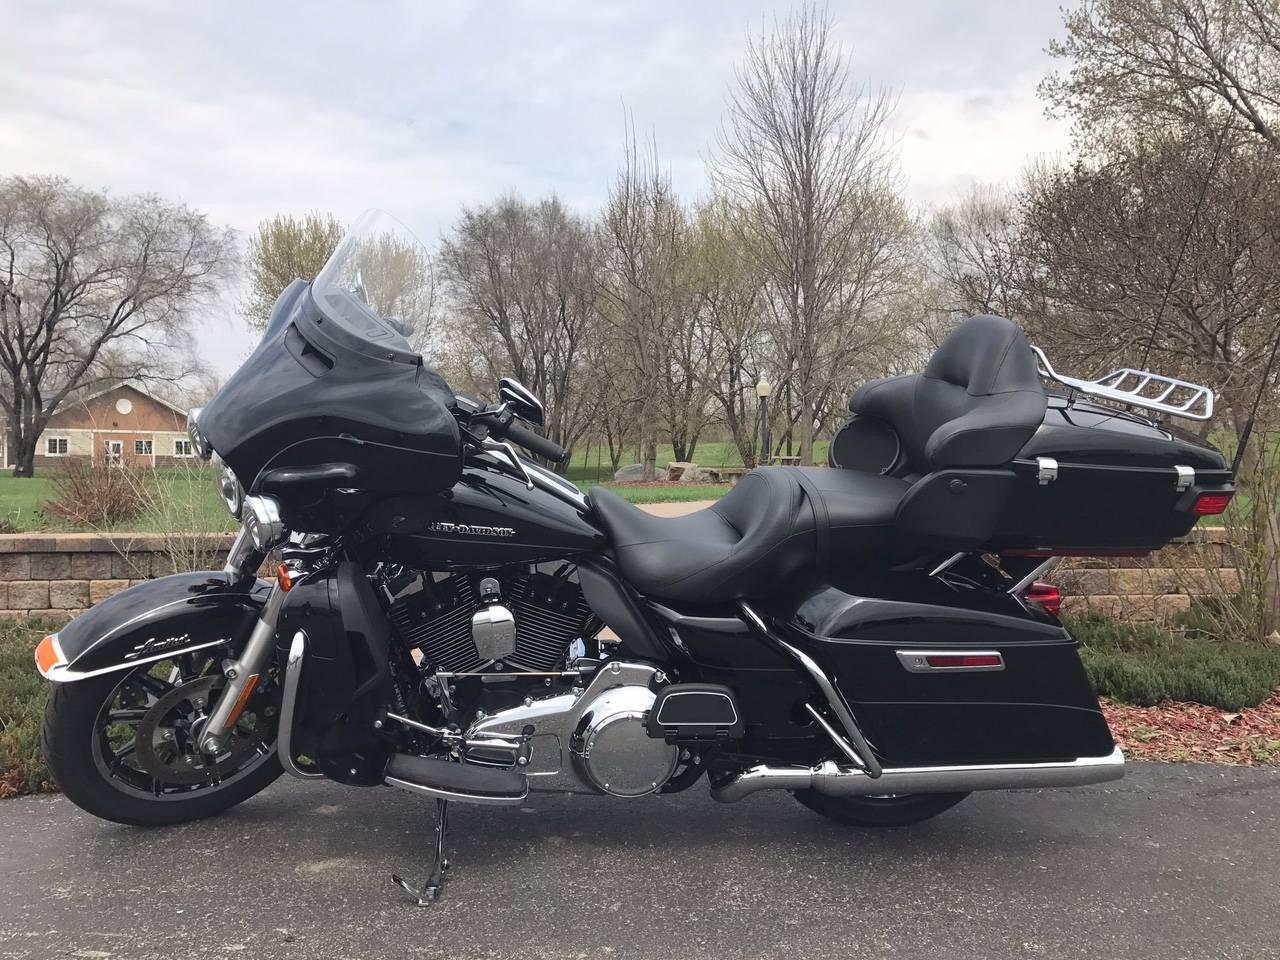 2016 Harley-Davidson Limited in Mankato, Minnesota